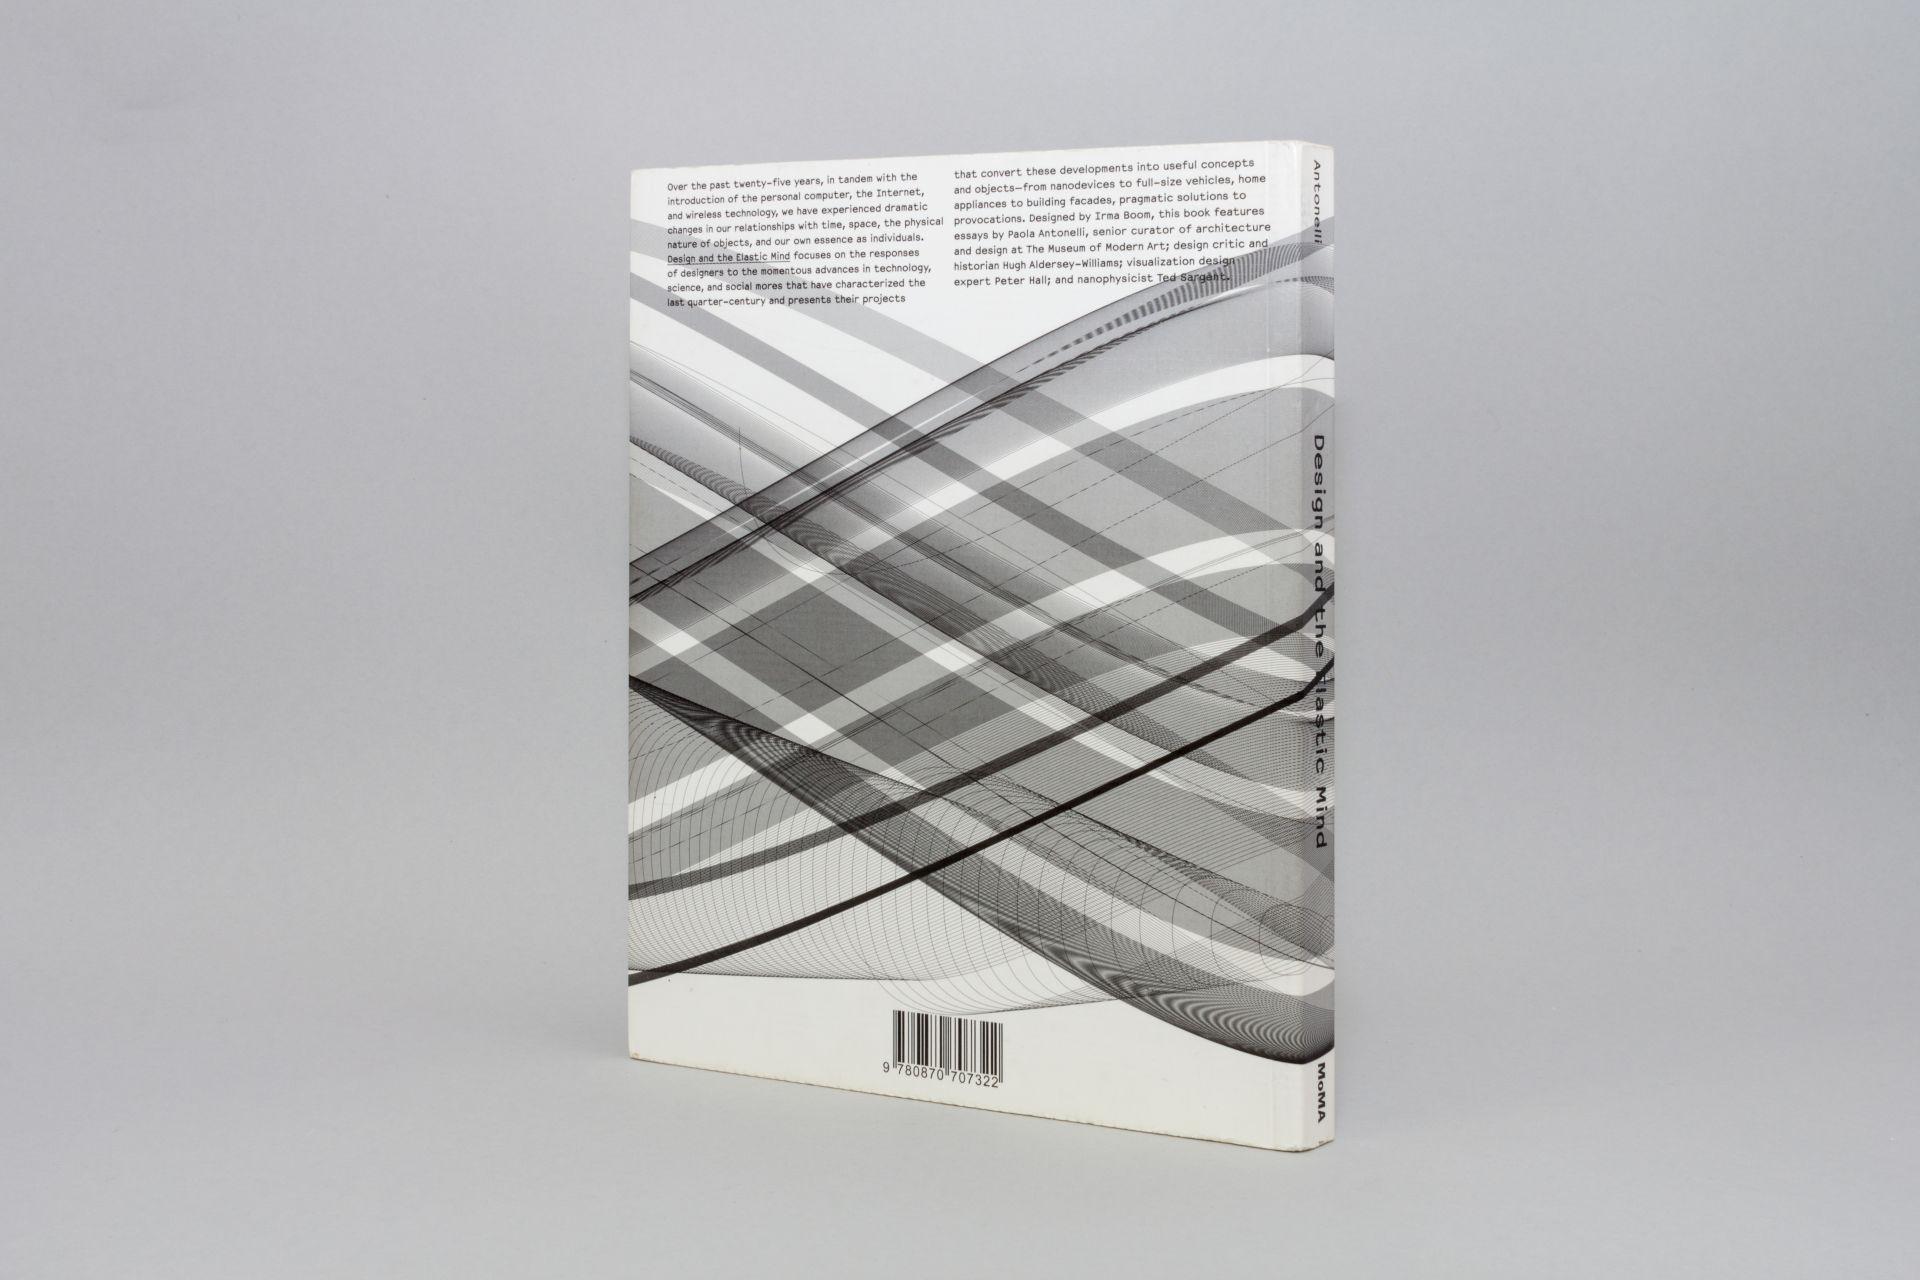 Daniël Maarleveld Design and the elastic mind